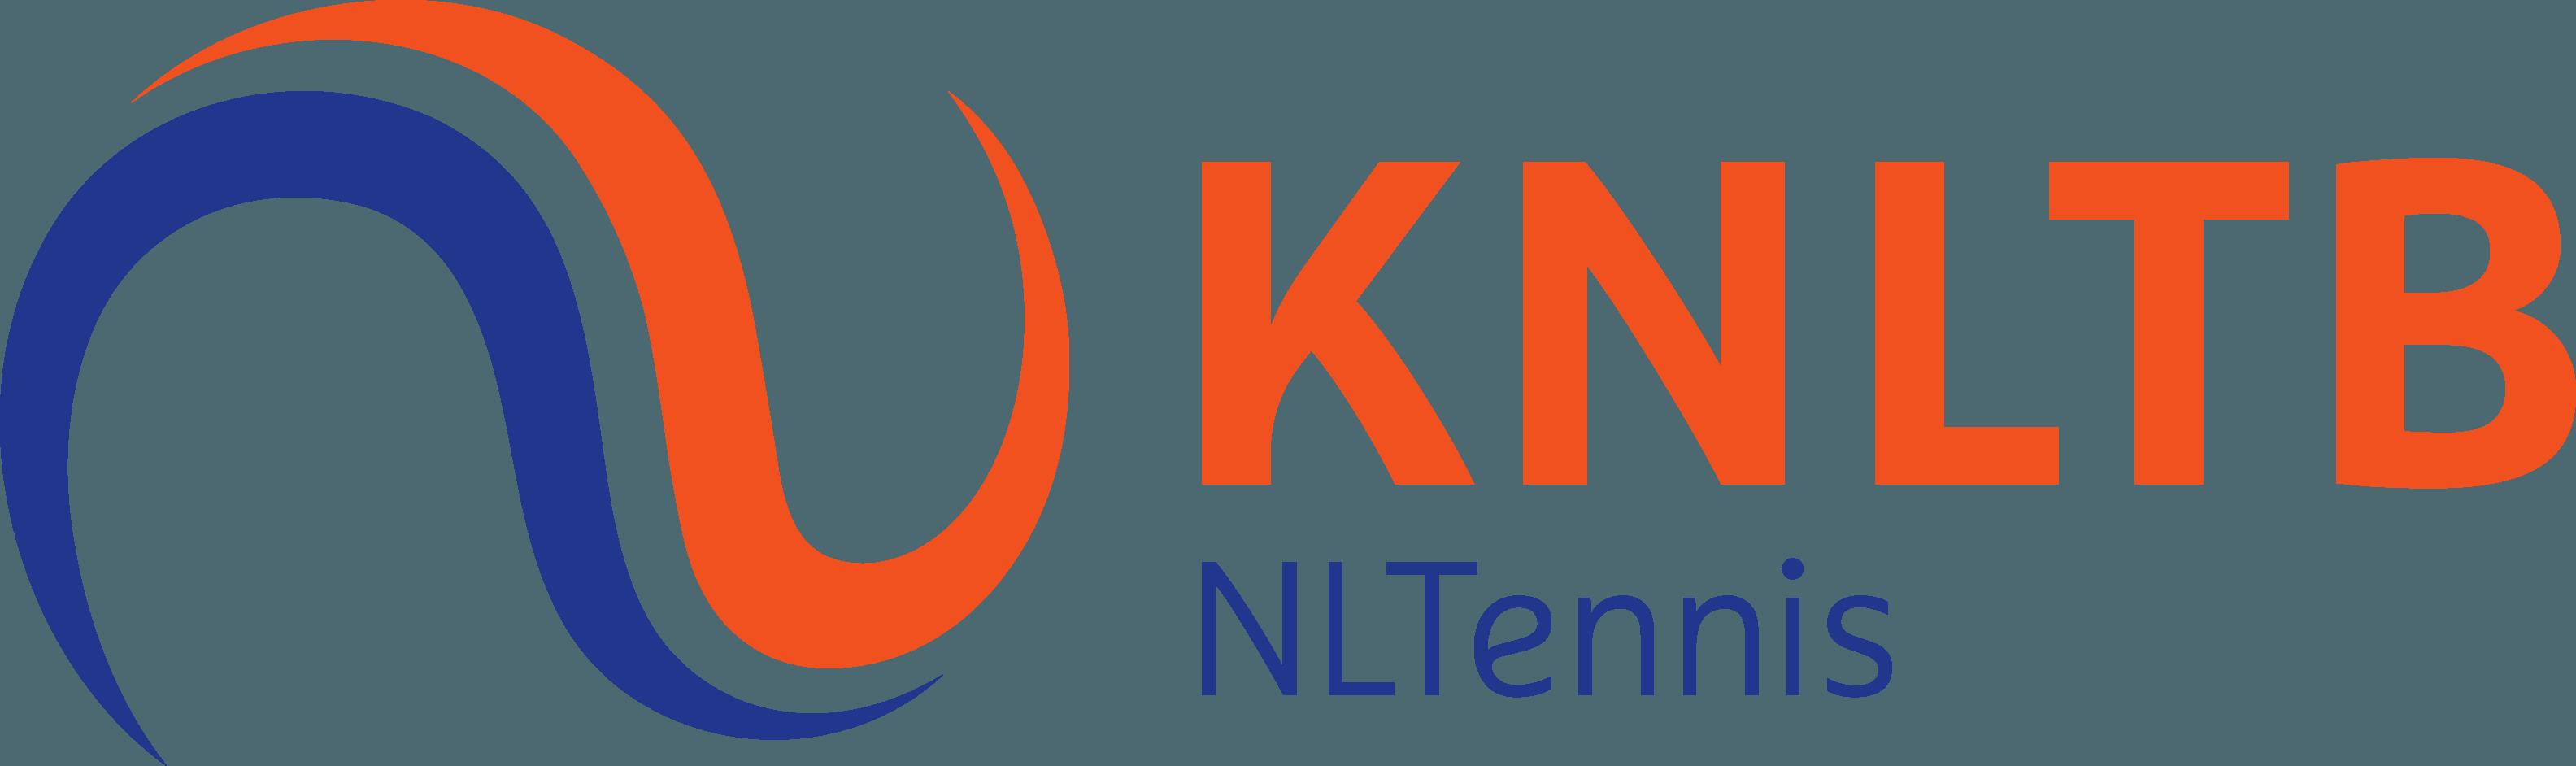 KNLTB logo